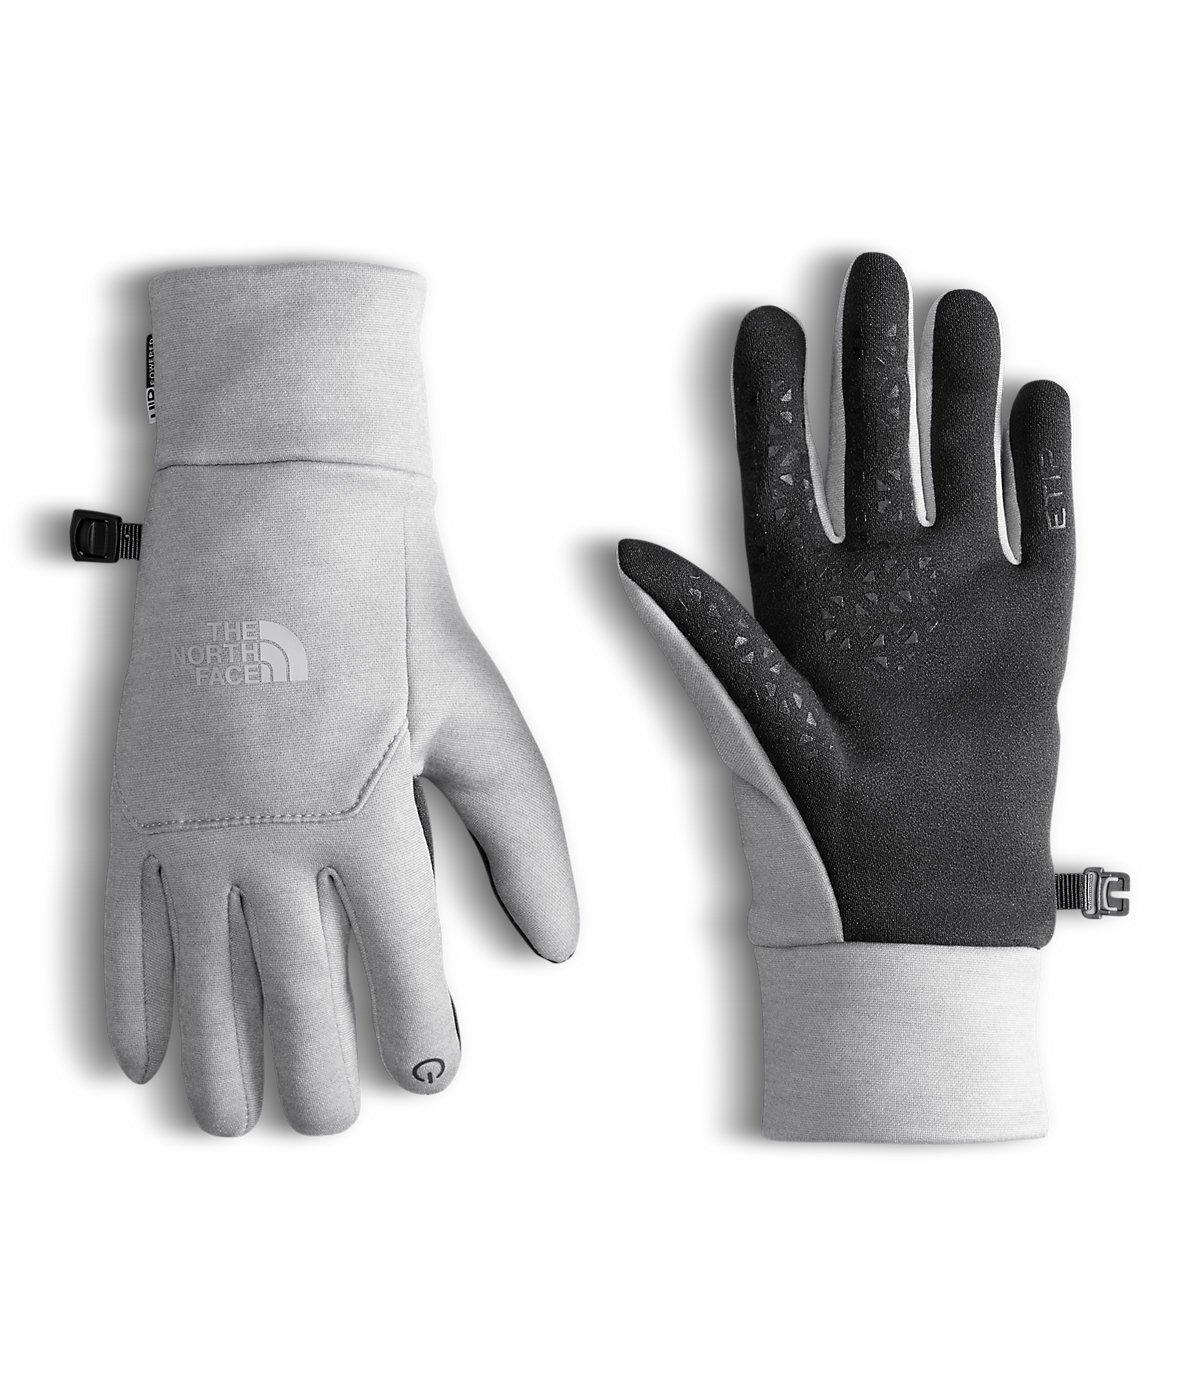 The North Face Women's Etip Glove (Sizes XS - L) - tnf light grey heather, xs